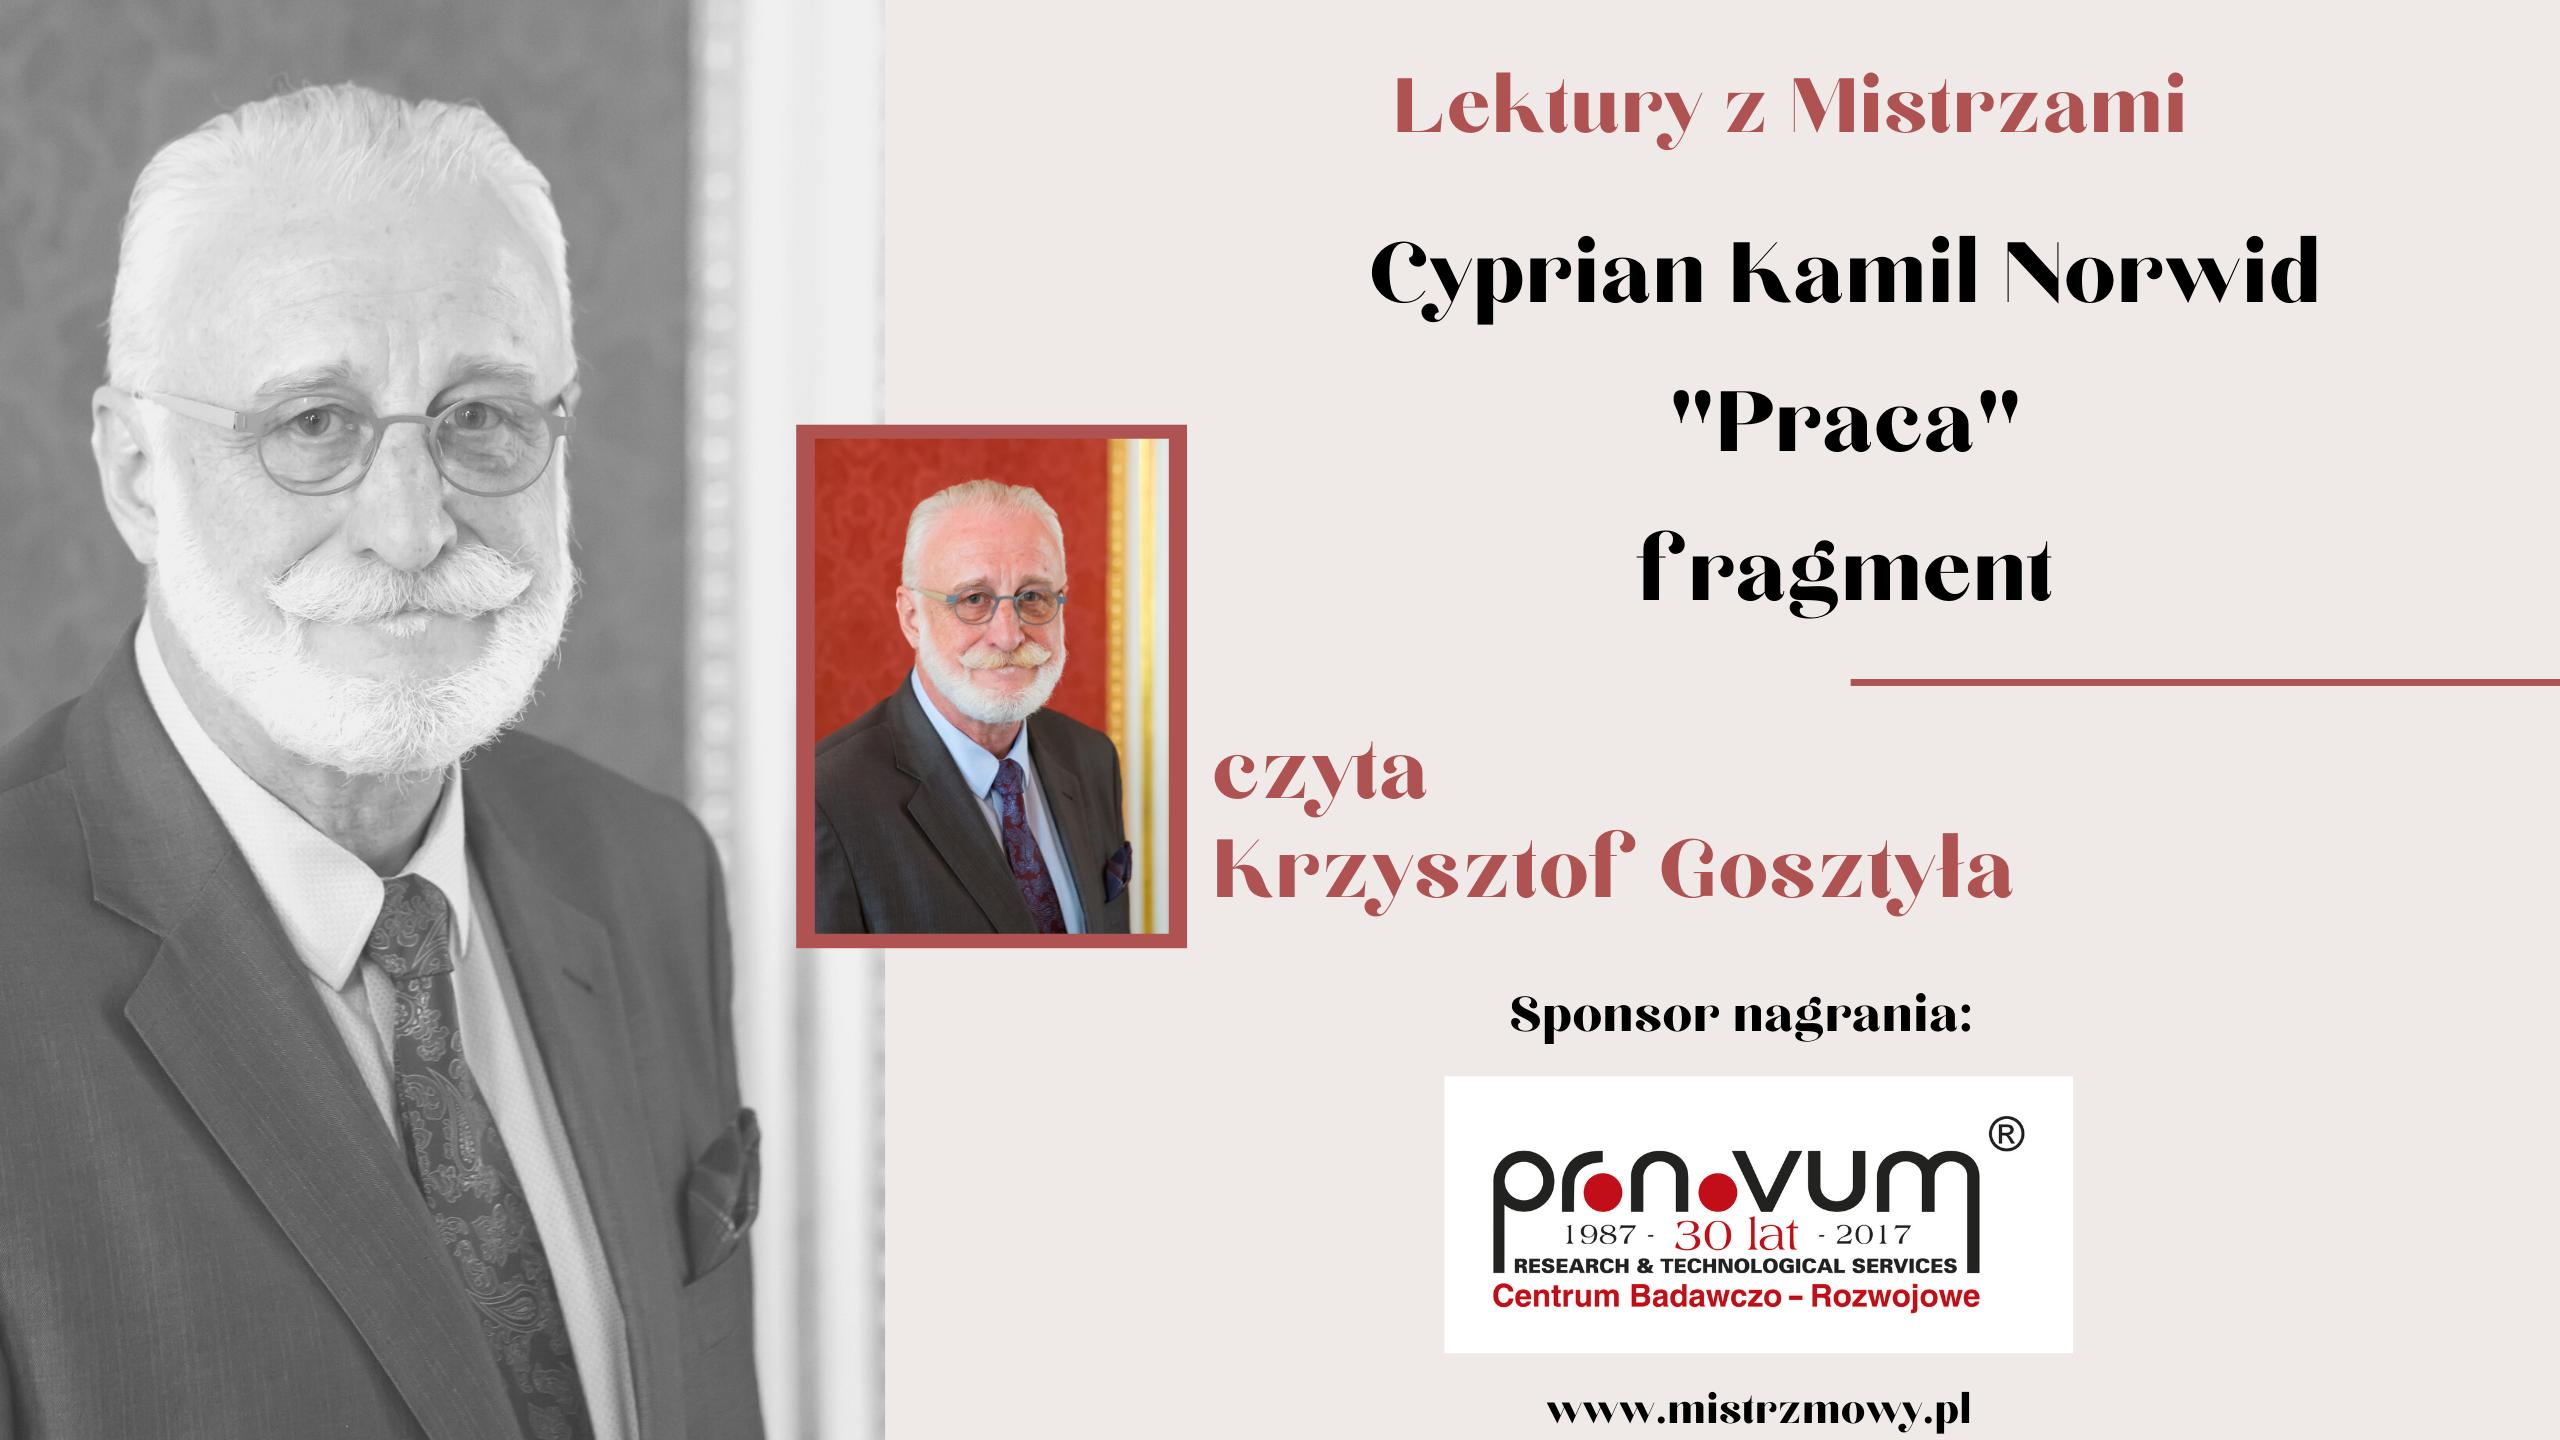 Cyprian Kamil Norwid - Praca